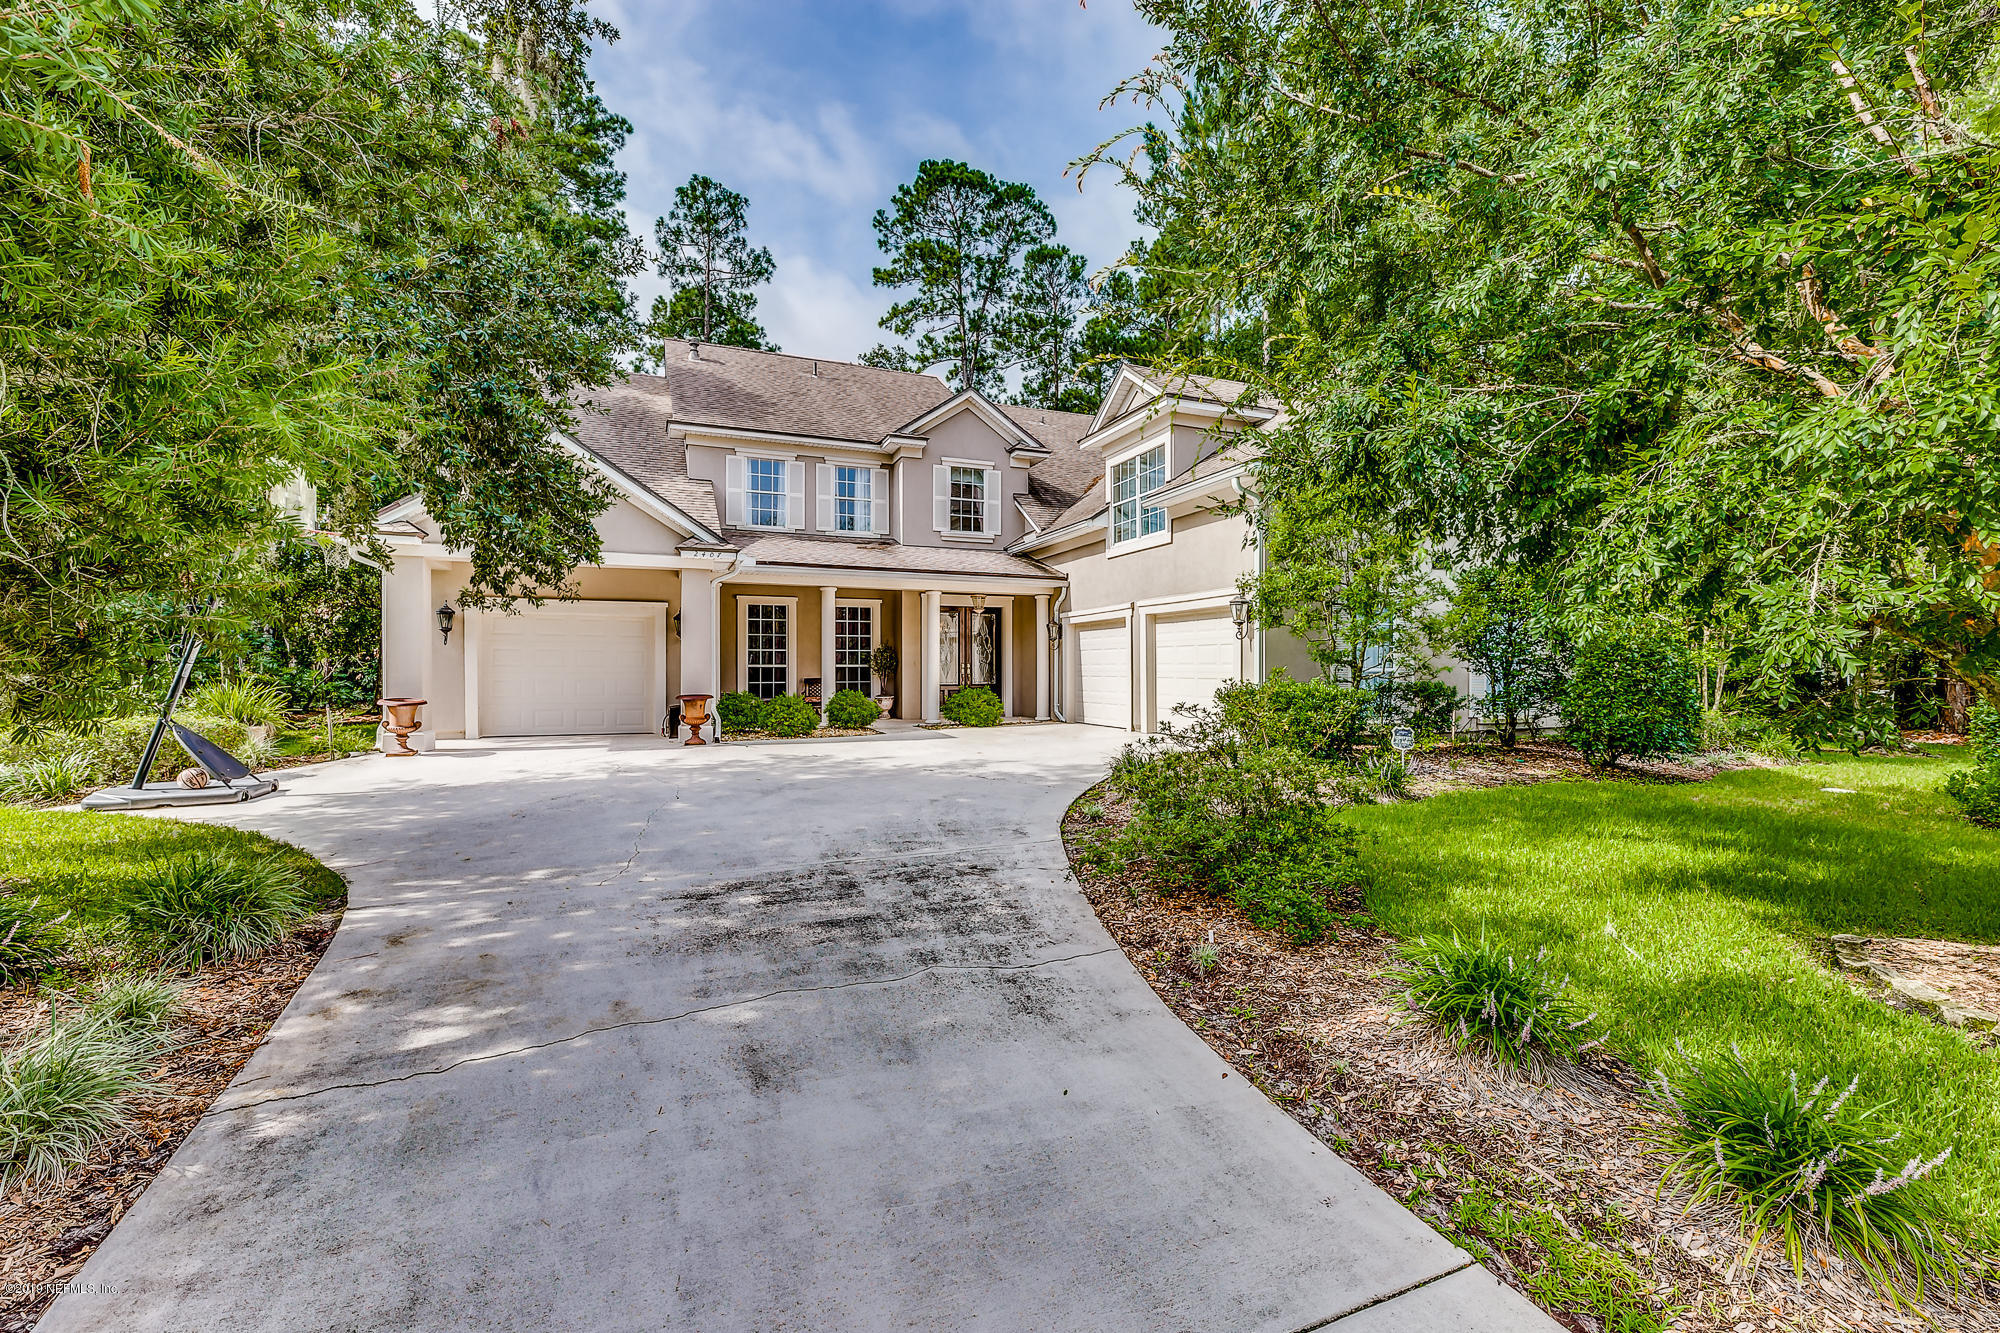 2407 DANIELS LANDING, FLEMING ISLAND, FLORIDA 32003, 4 Bedrooms Bedrooms, ,5 BathroomsBathrooms,Residential - single family,For sale,DANIELS LANDING,1010240